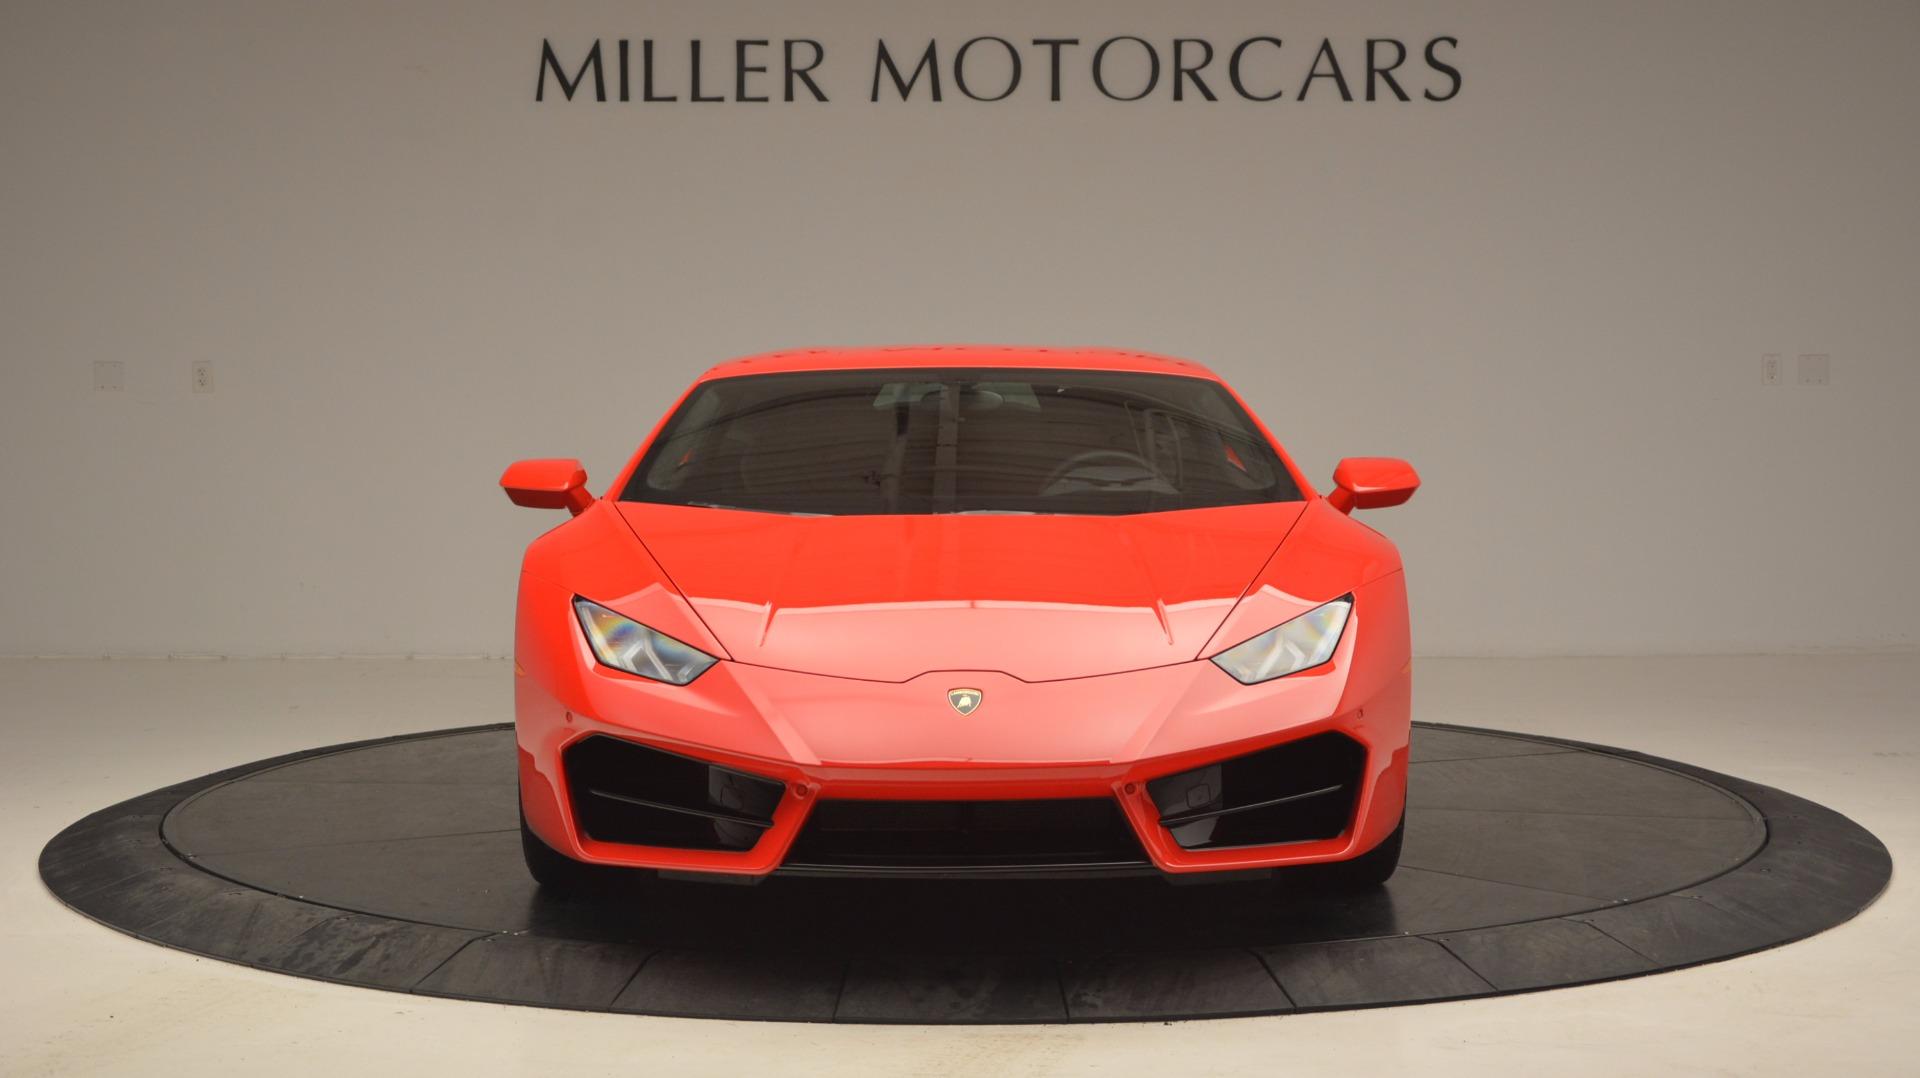 Used 2016 Lamborghini Huracan LP 580-2 For Sale In Greenwich, CT. Alfa Romeo of Greenwich, 7184 1070_p12